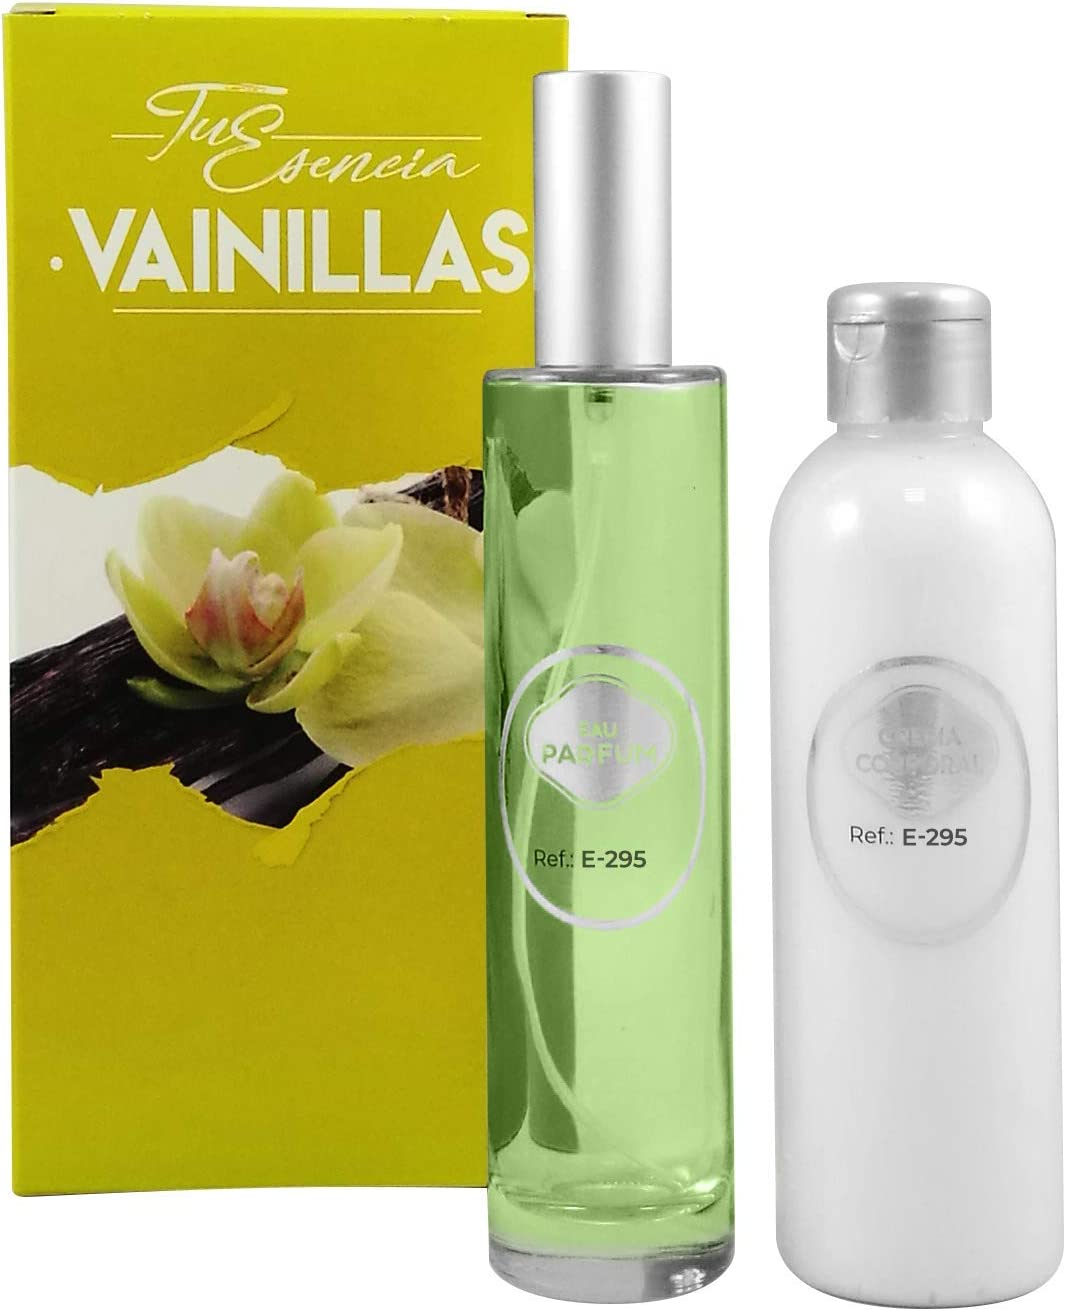 Pack Tu Esencia Vainillas Esenssi • Perfume E-295 Belle Vita 100 ml + Crema Corporal Perfumada E-295 200 ml • Acordes similares La Vie Est Belle Lancomê, Si Armani y Burberry Woman: Amazon.es: Belleza